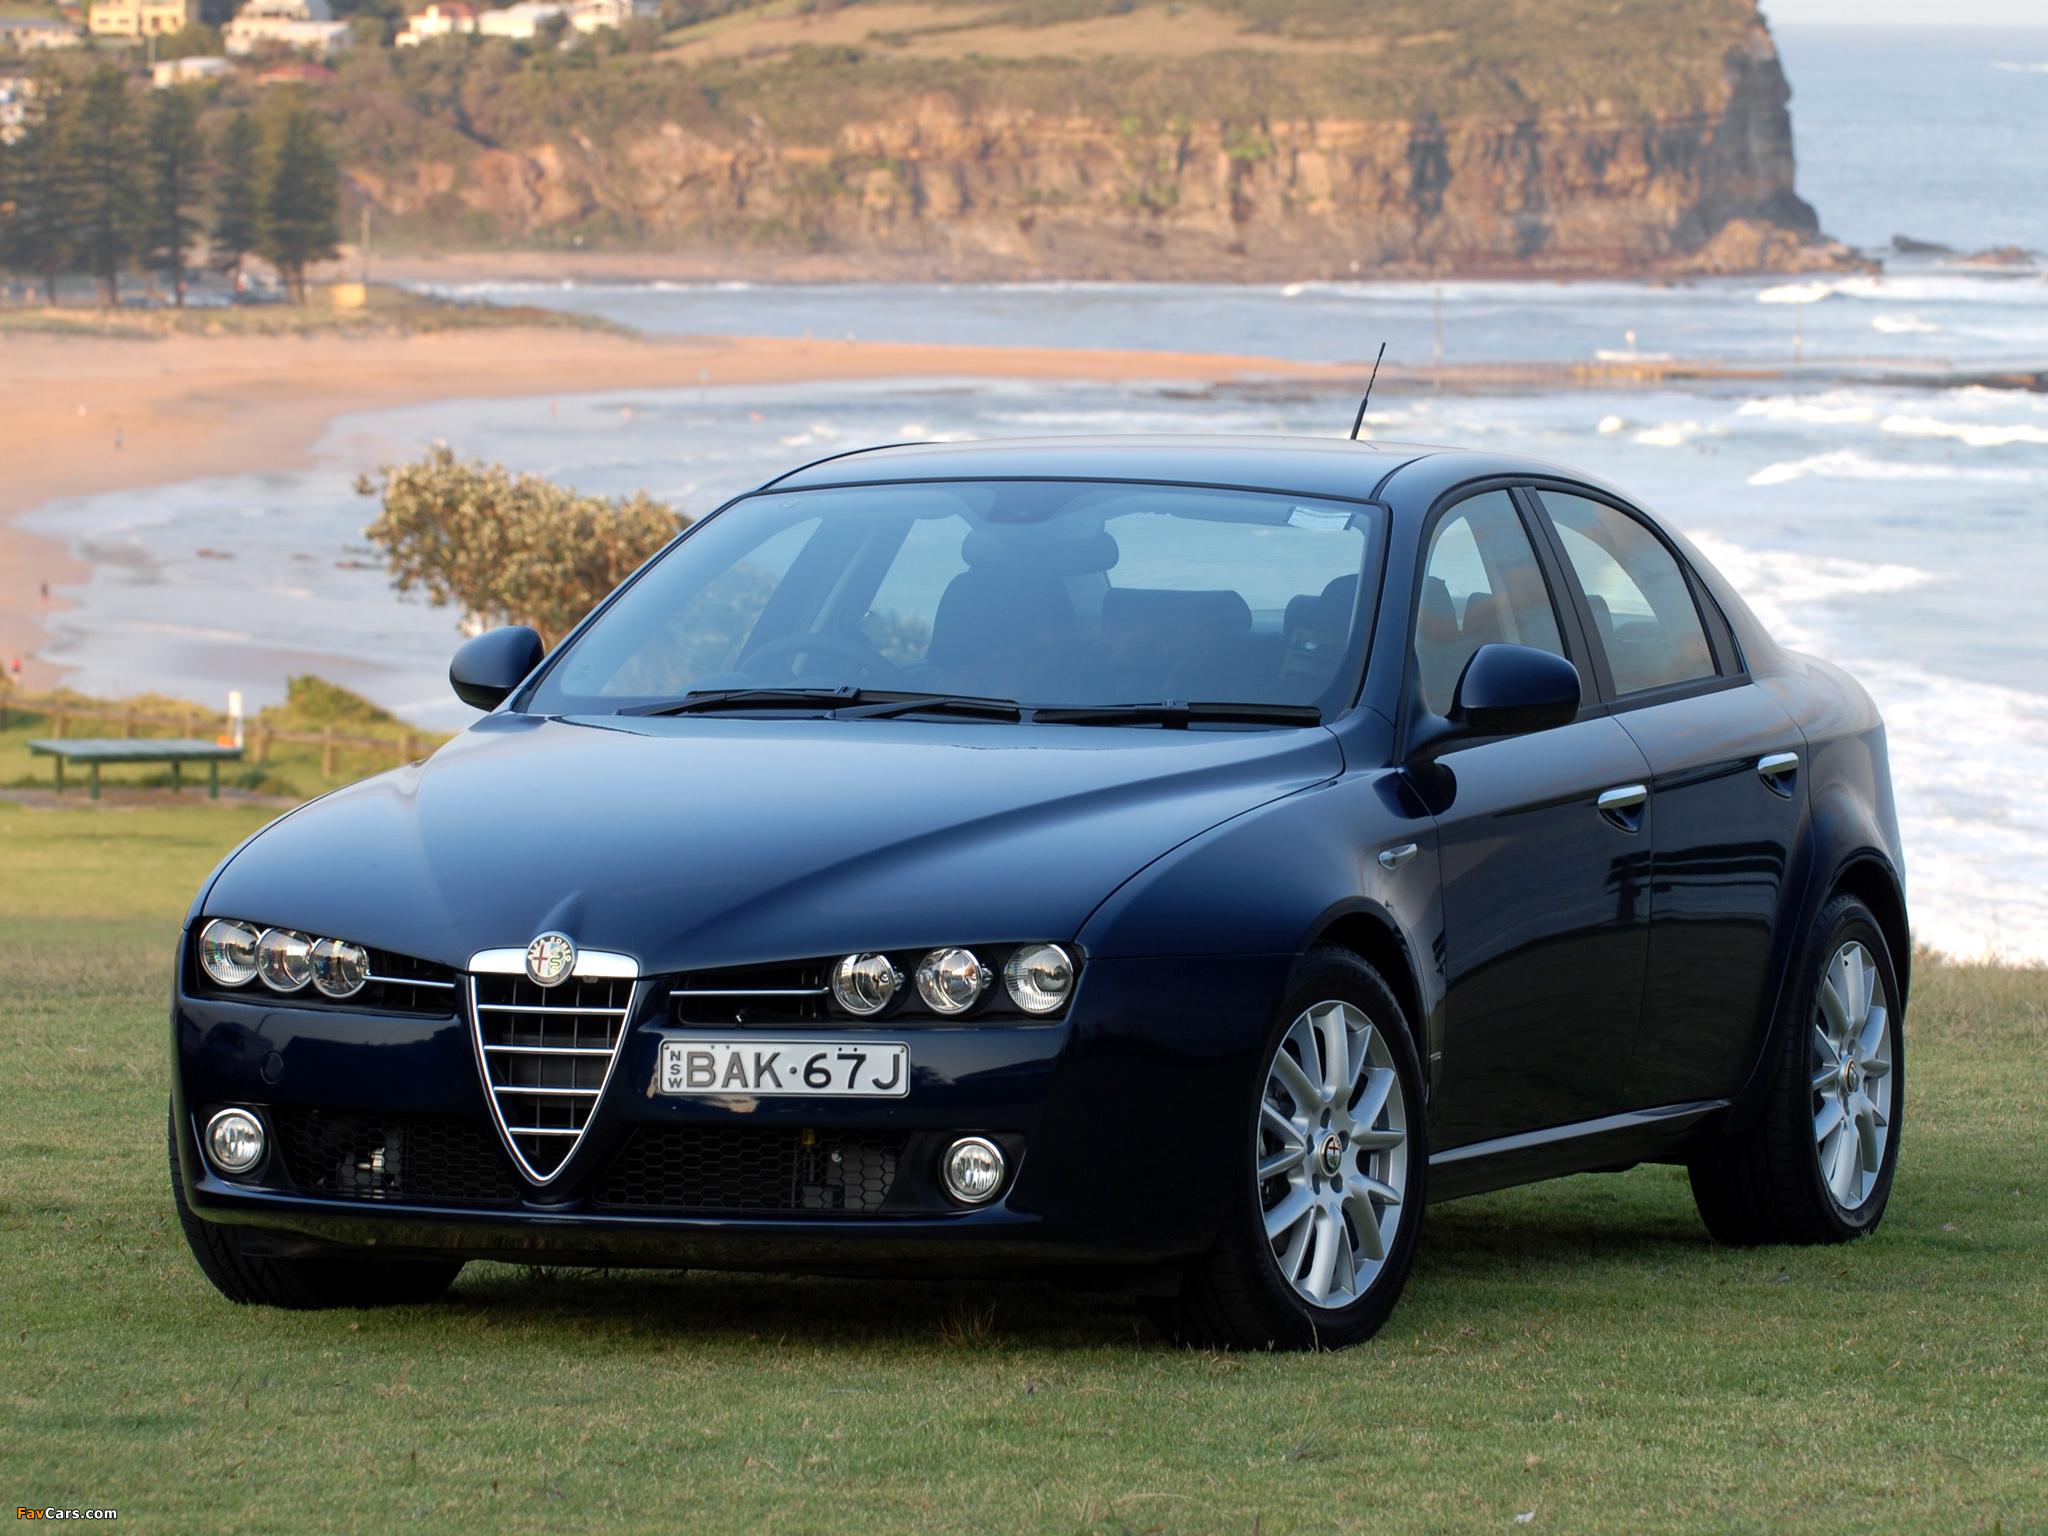 1024x768 Car Wallpapers Alfa Romeo 159 1 9 Jtdm Au Spec 939a 2006 2008